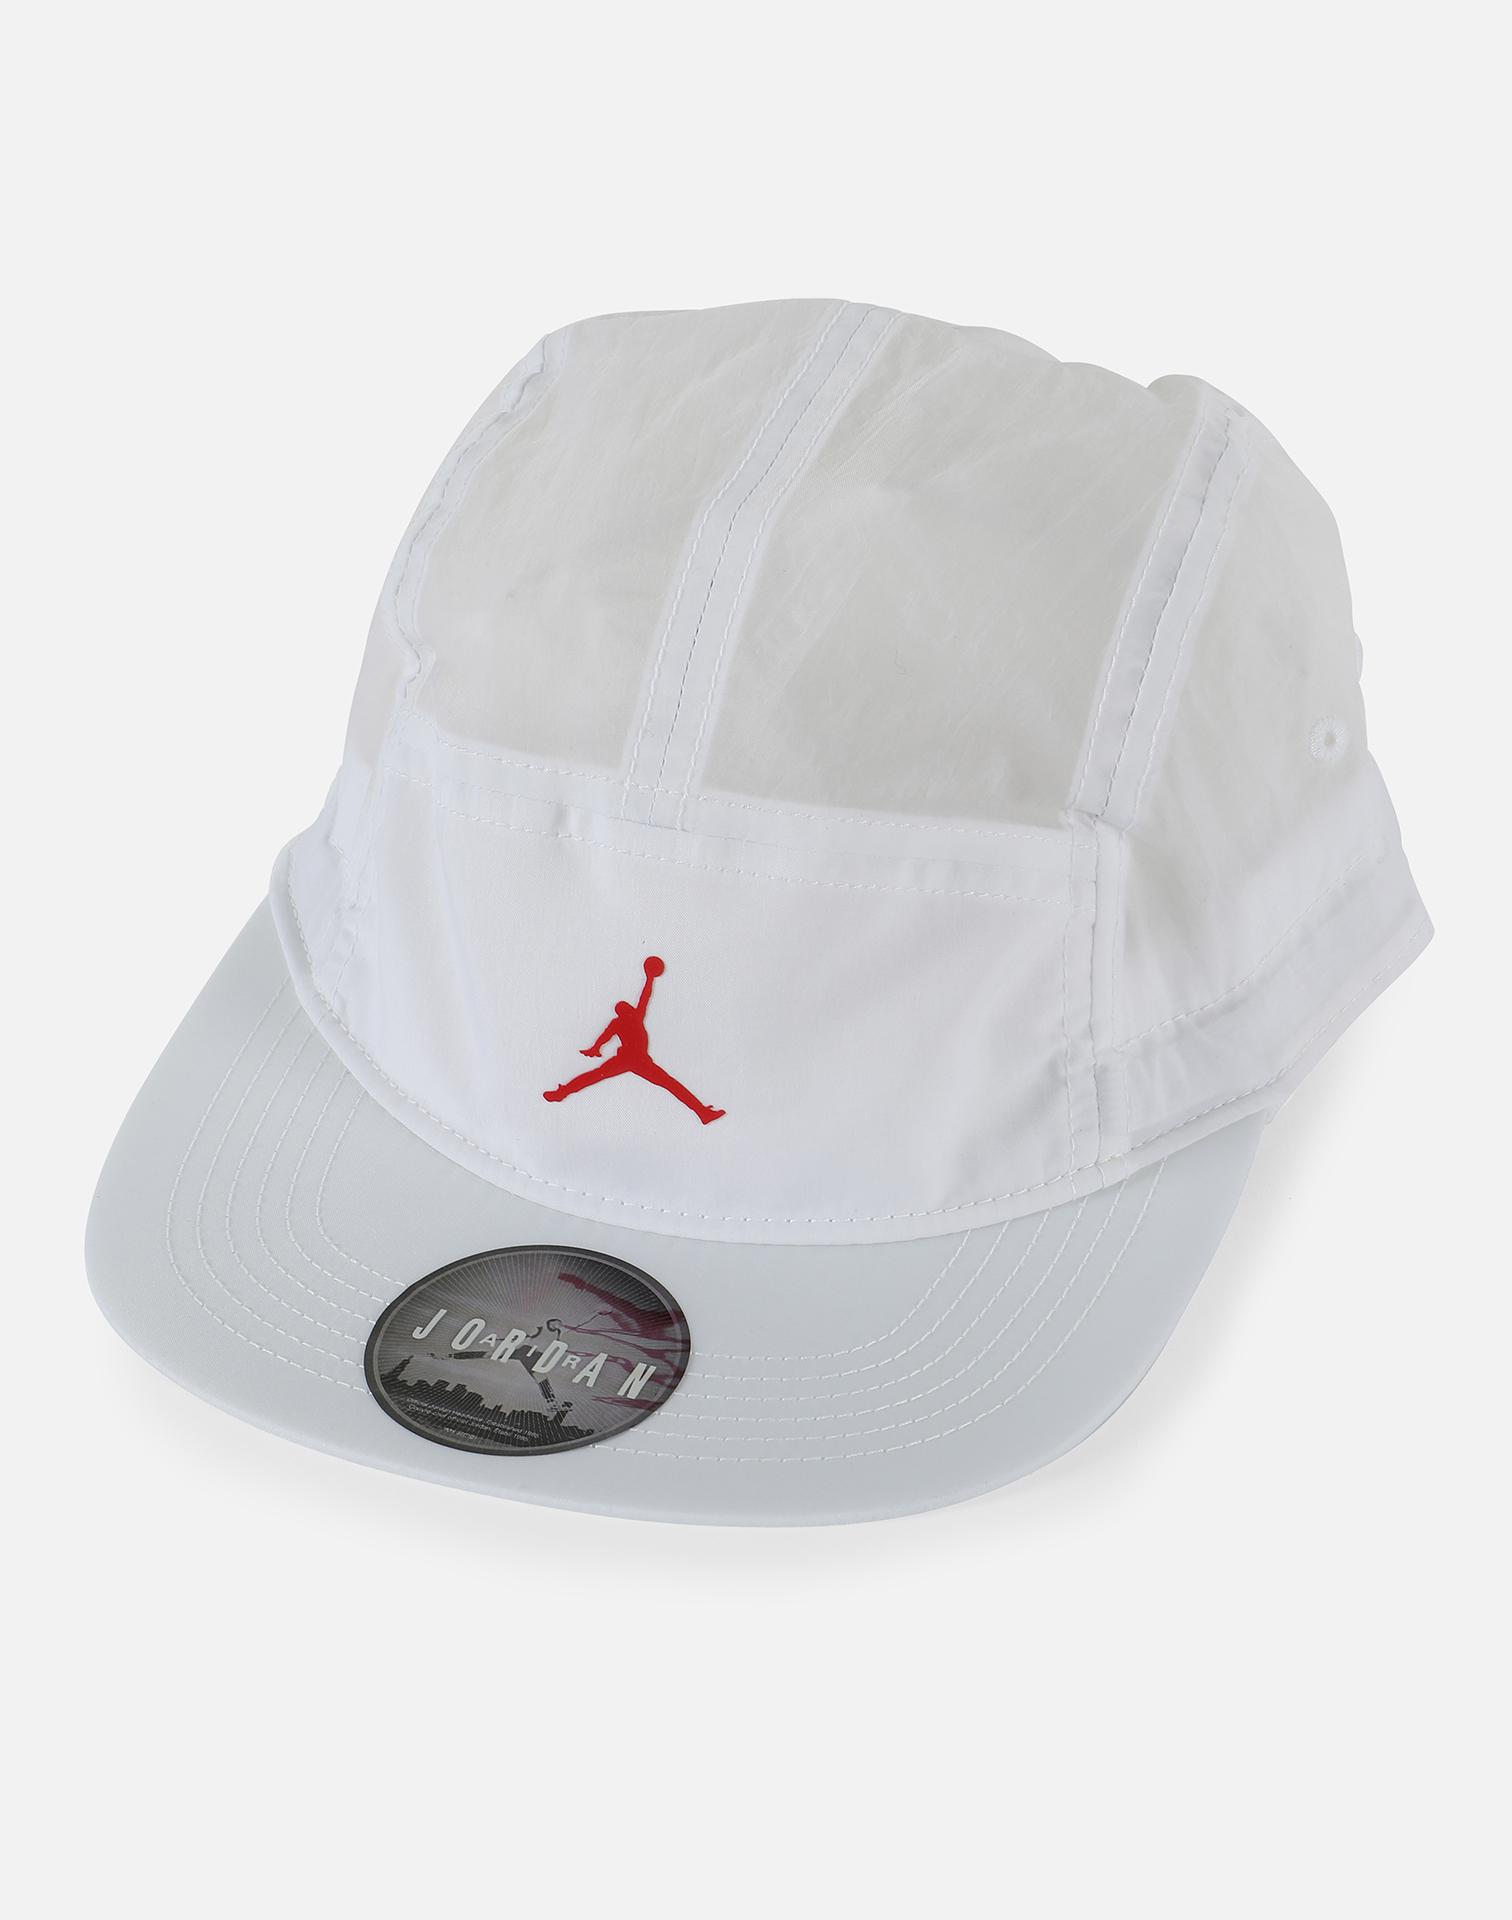 b64476333d6 ... usa lyst nike aw84 jumpman classic cap in white for men f041e 3bbed  best price air jordan ...